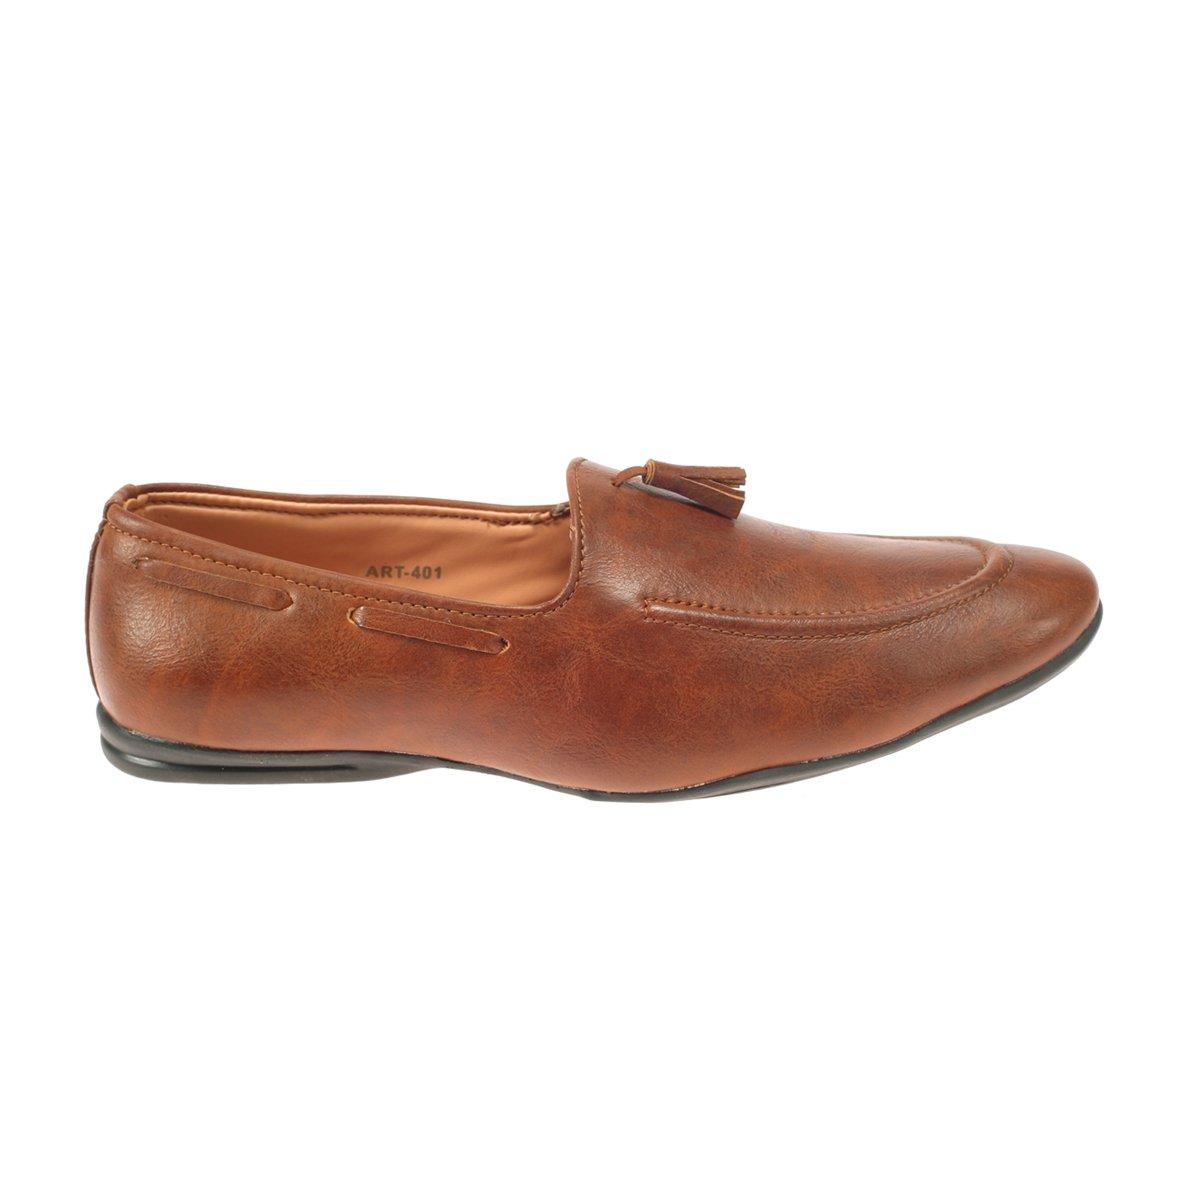 H\u0026V Mens Leather Tan Brown Colour Shoes